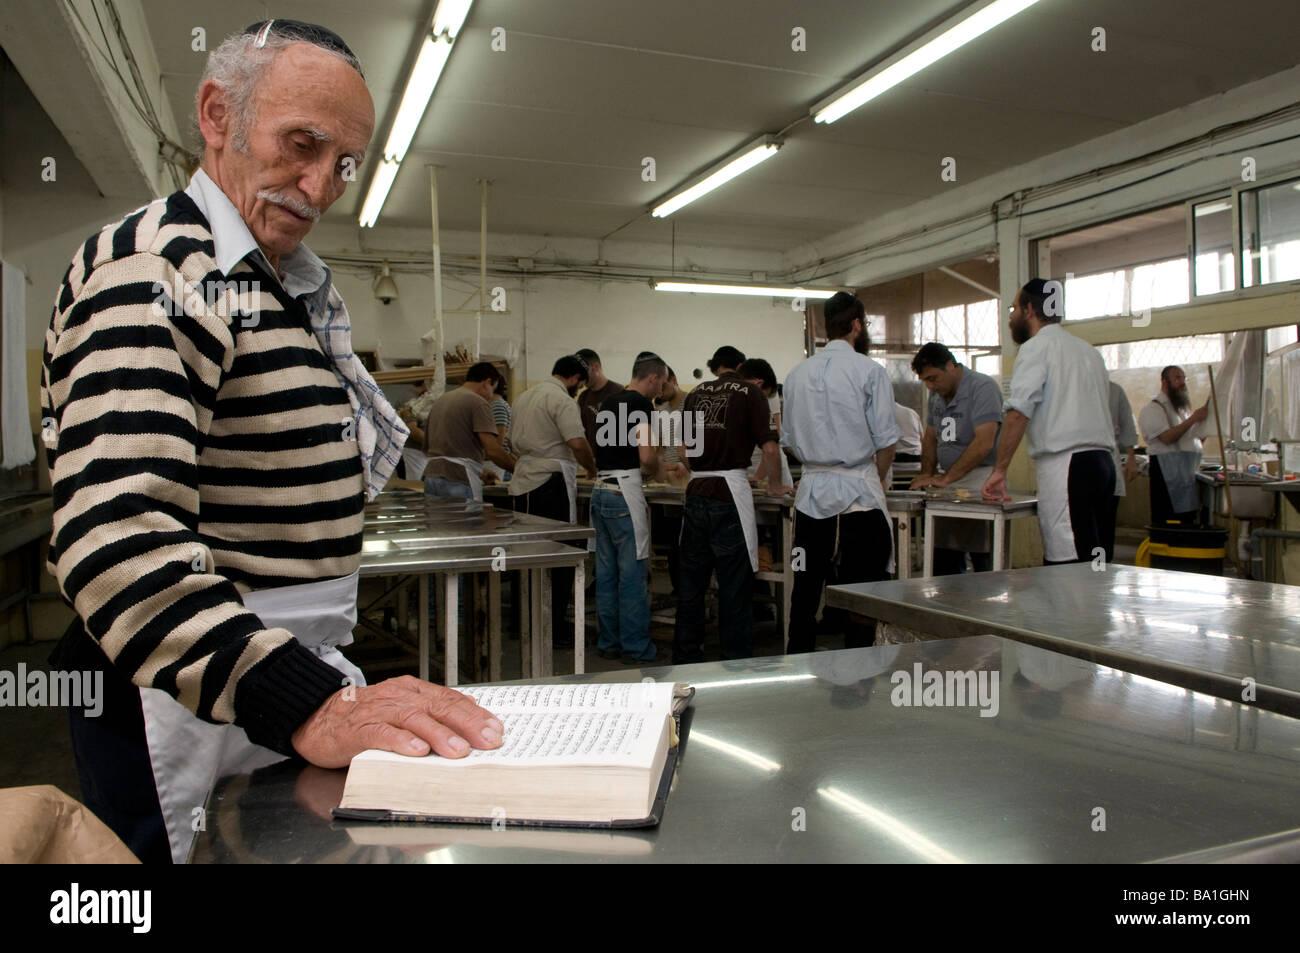 A religious jew prays as other orthodox Jews prepare Matzah traditional handmade Passover unleavened bread in Kfar - Stock Image